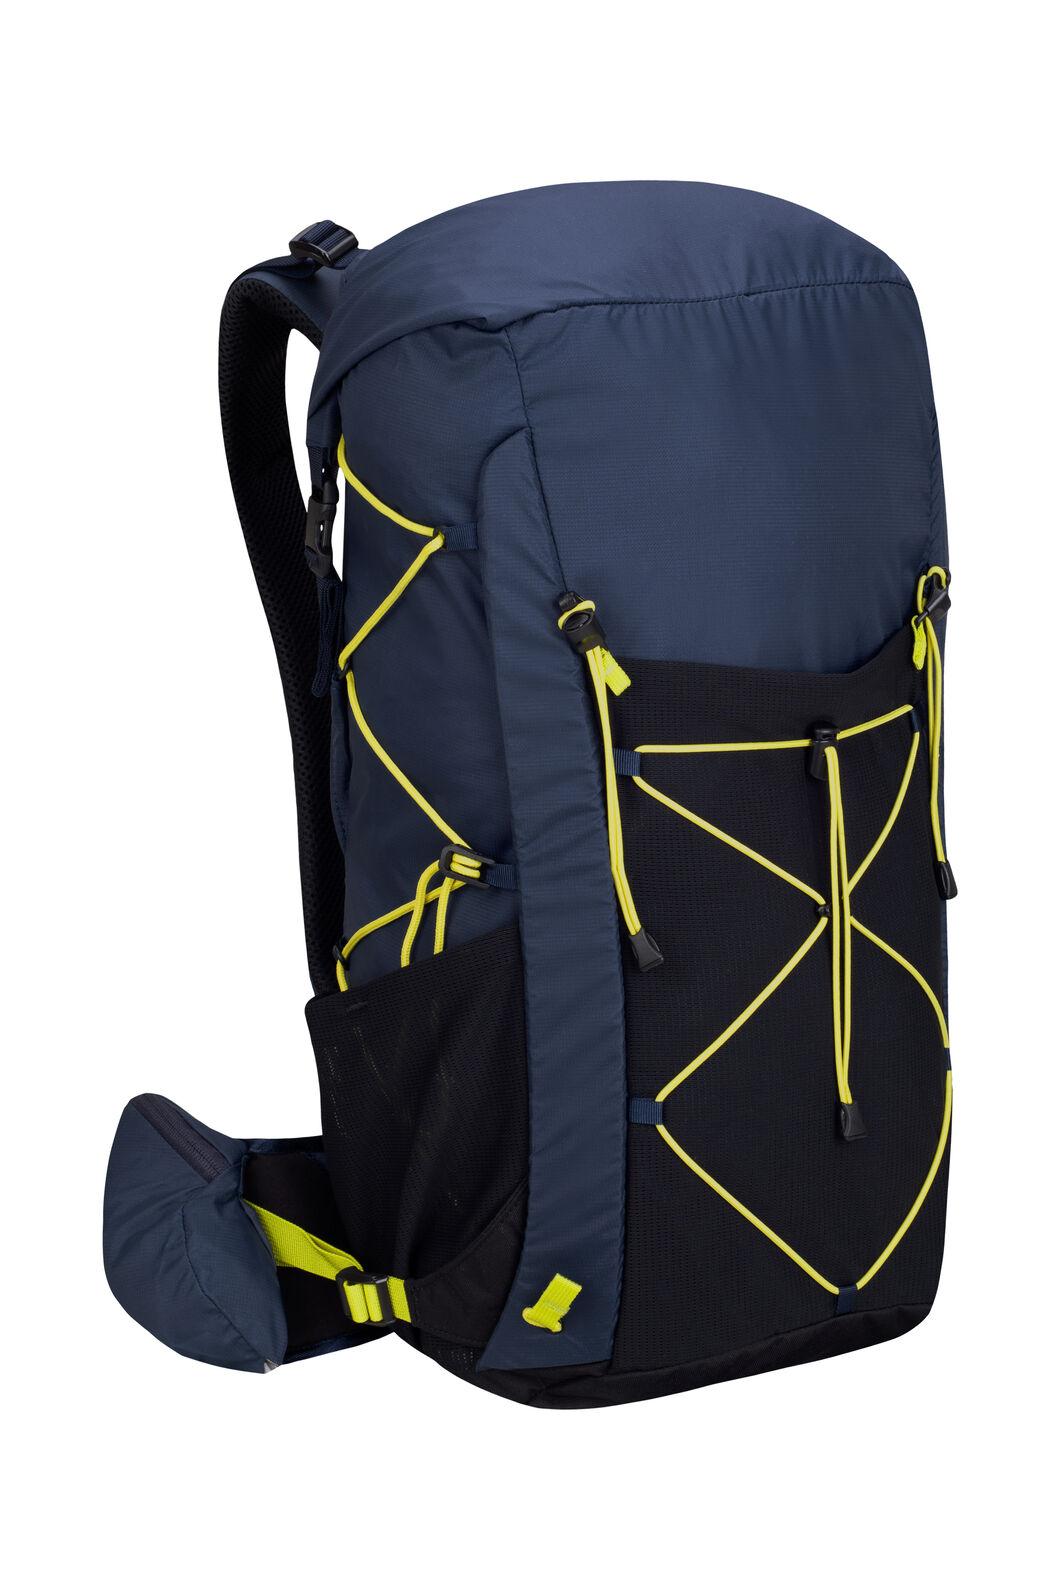 Macpac Fiord 28L Hiking Pack, Black Iris, hi-res